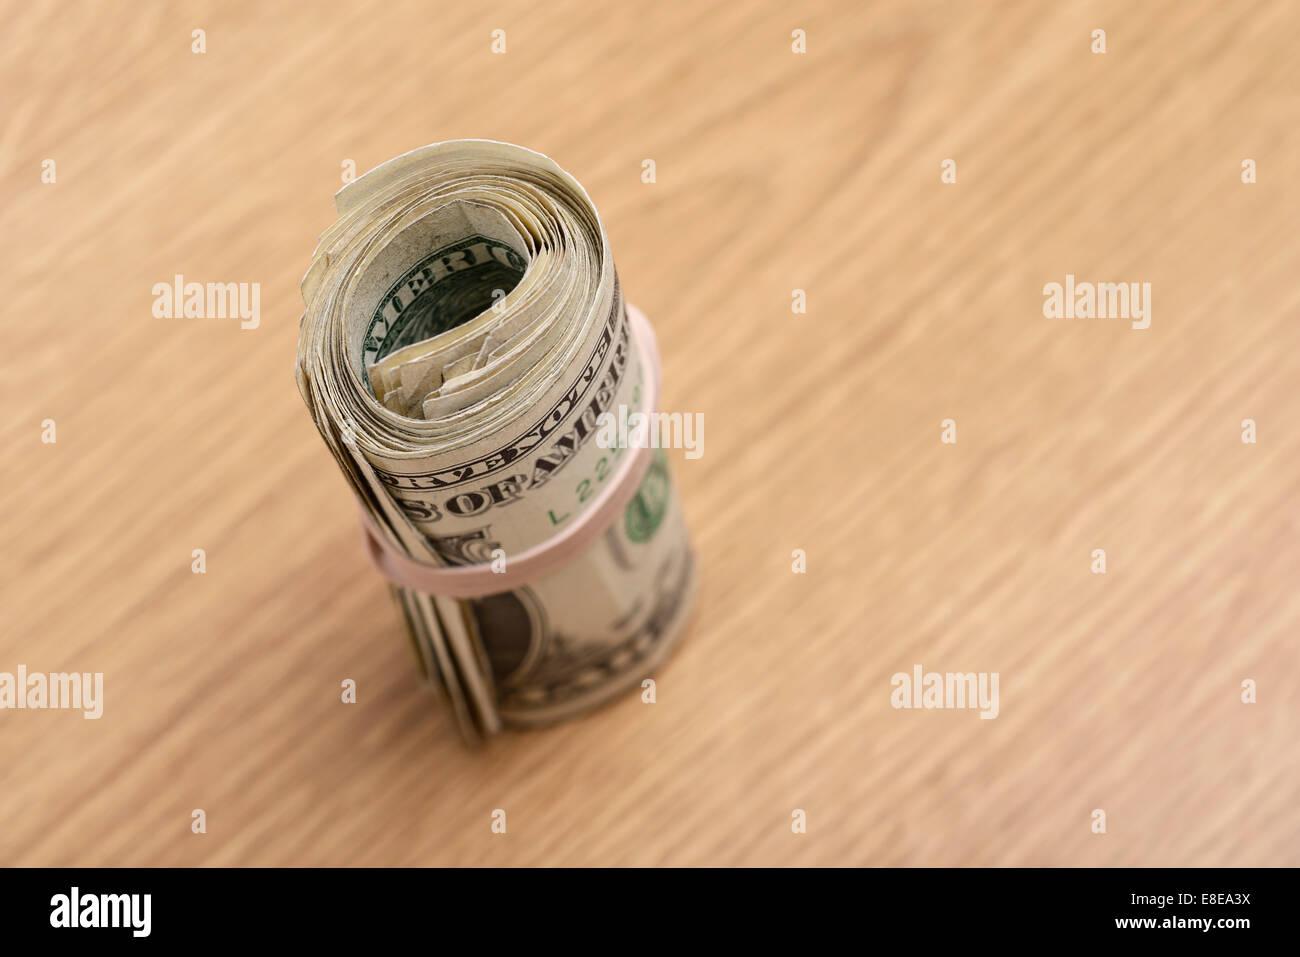 Bundle of US One Dollar Bills - Stock Image